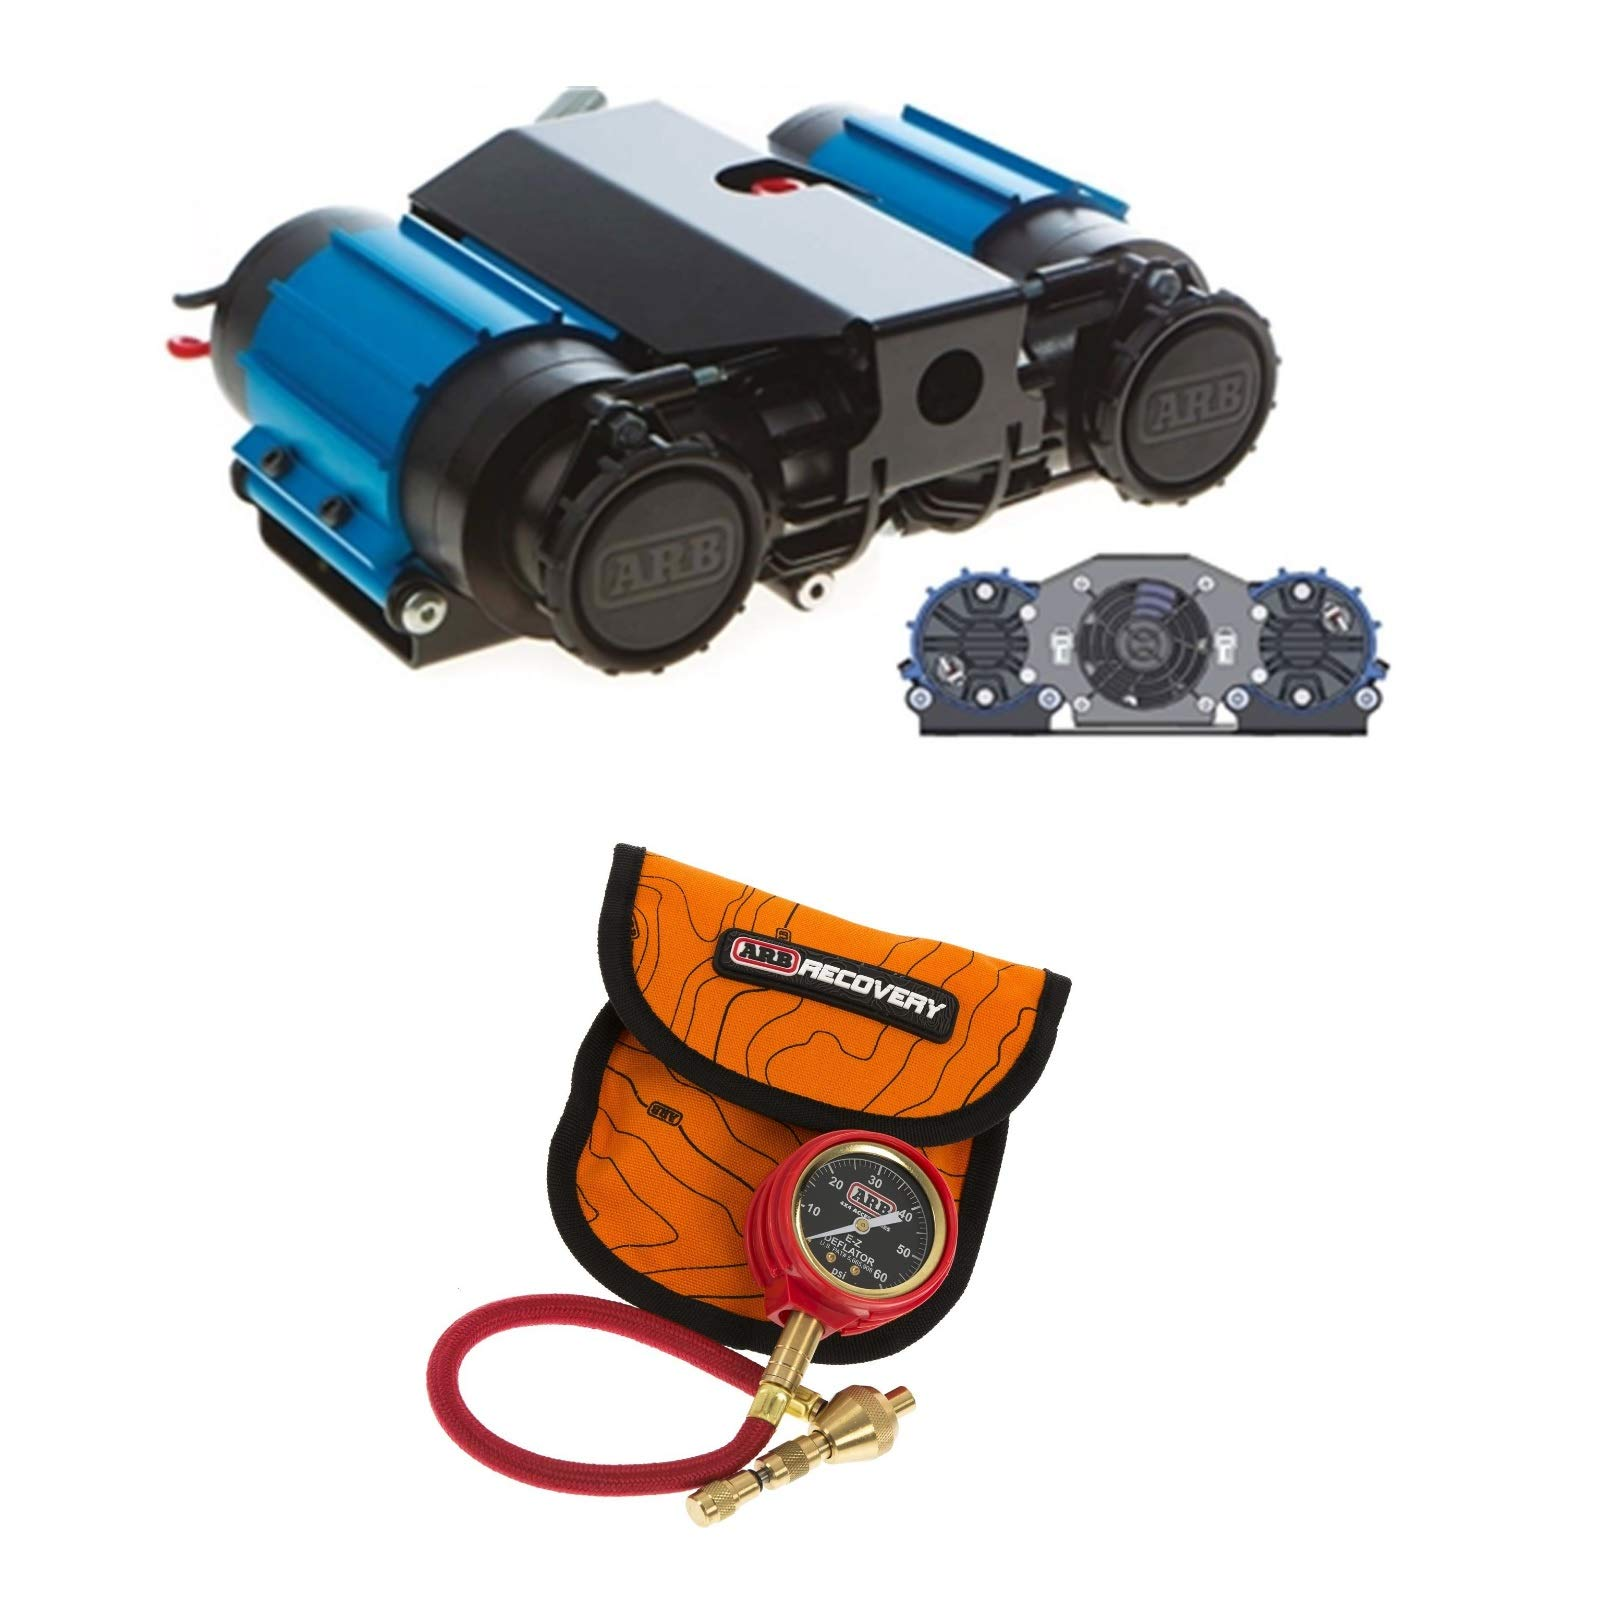 ARB CKMTA12/ARB505 On-Board Twin High Performance 12 Volt Air Compressor & E-Z Deflator Bundle